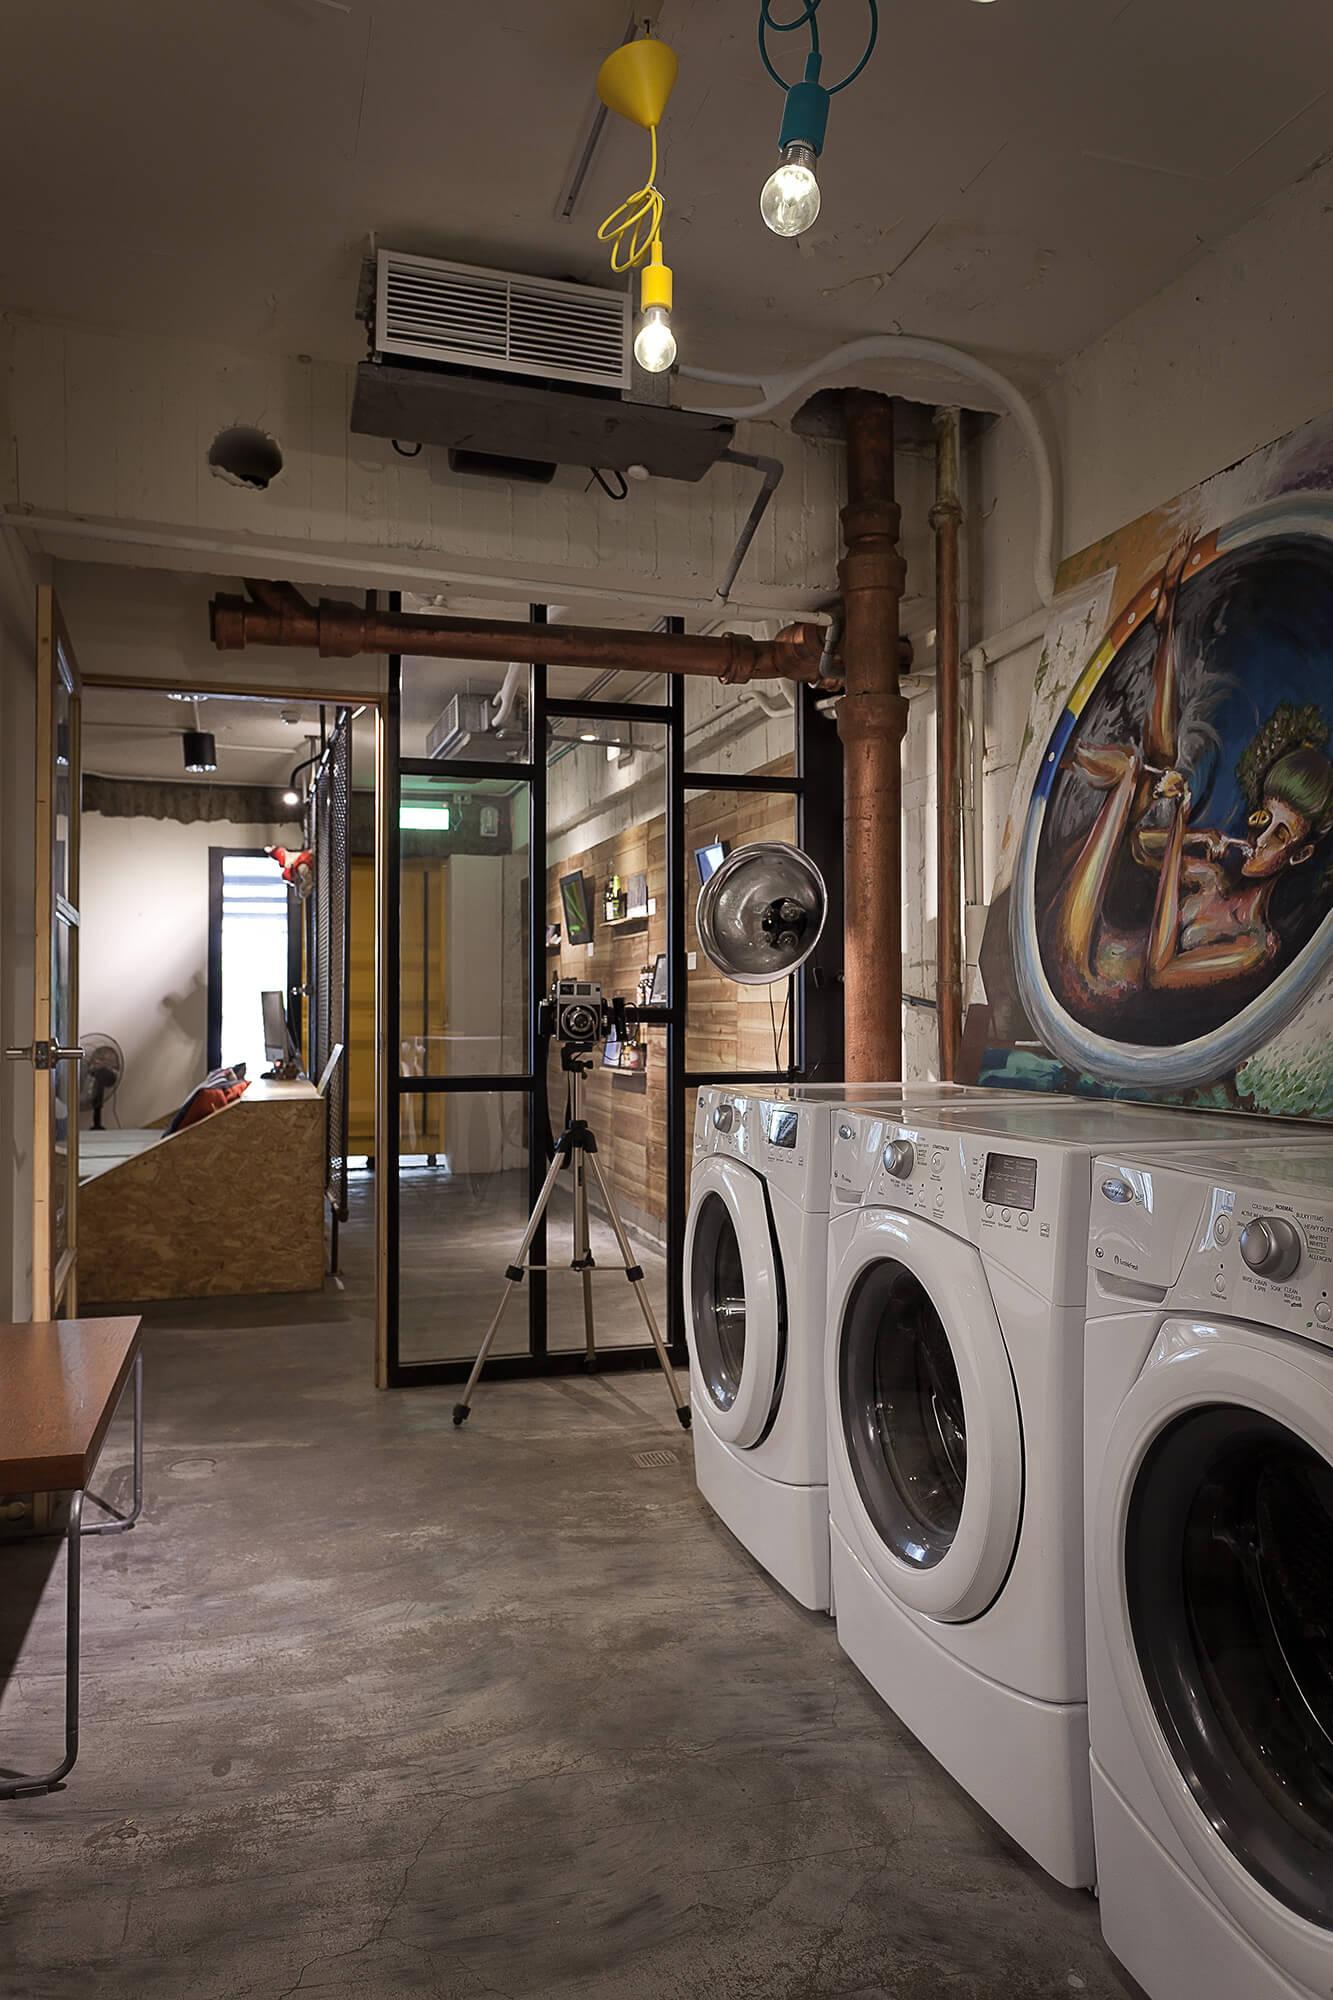 009-laundry-coffee-shop-formo-design-studio